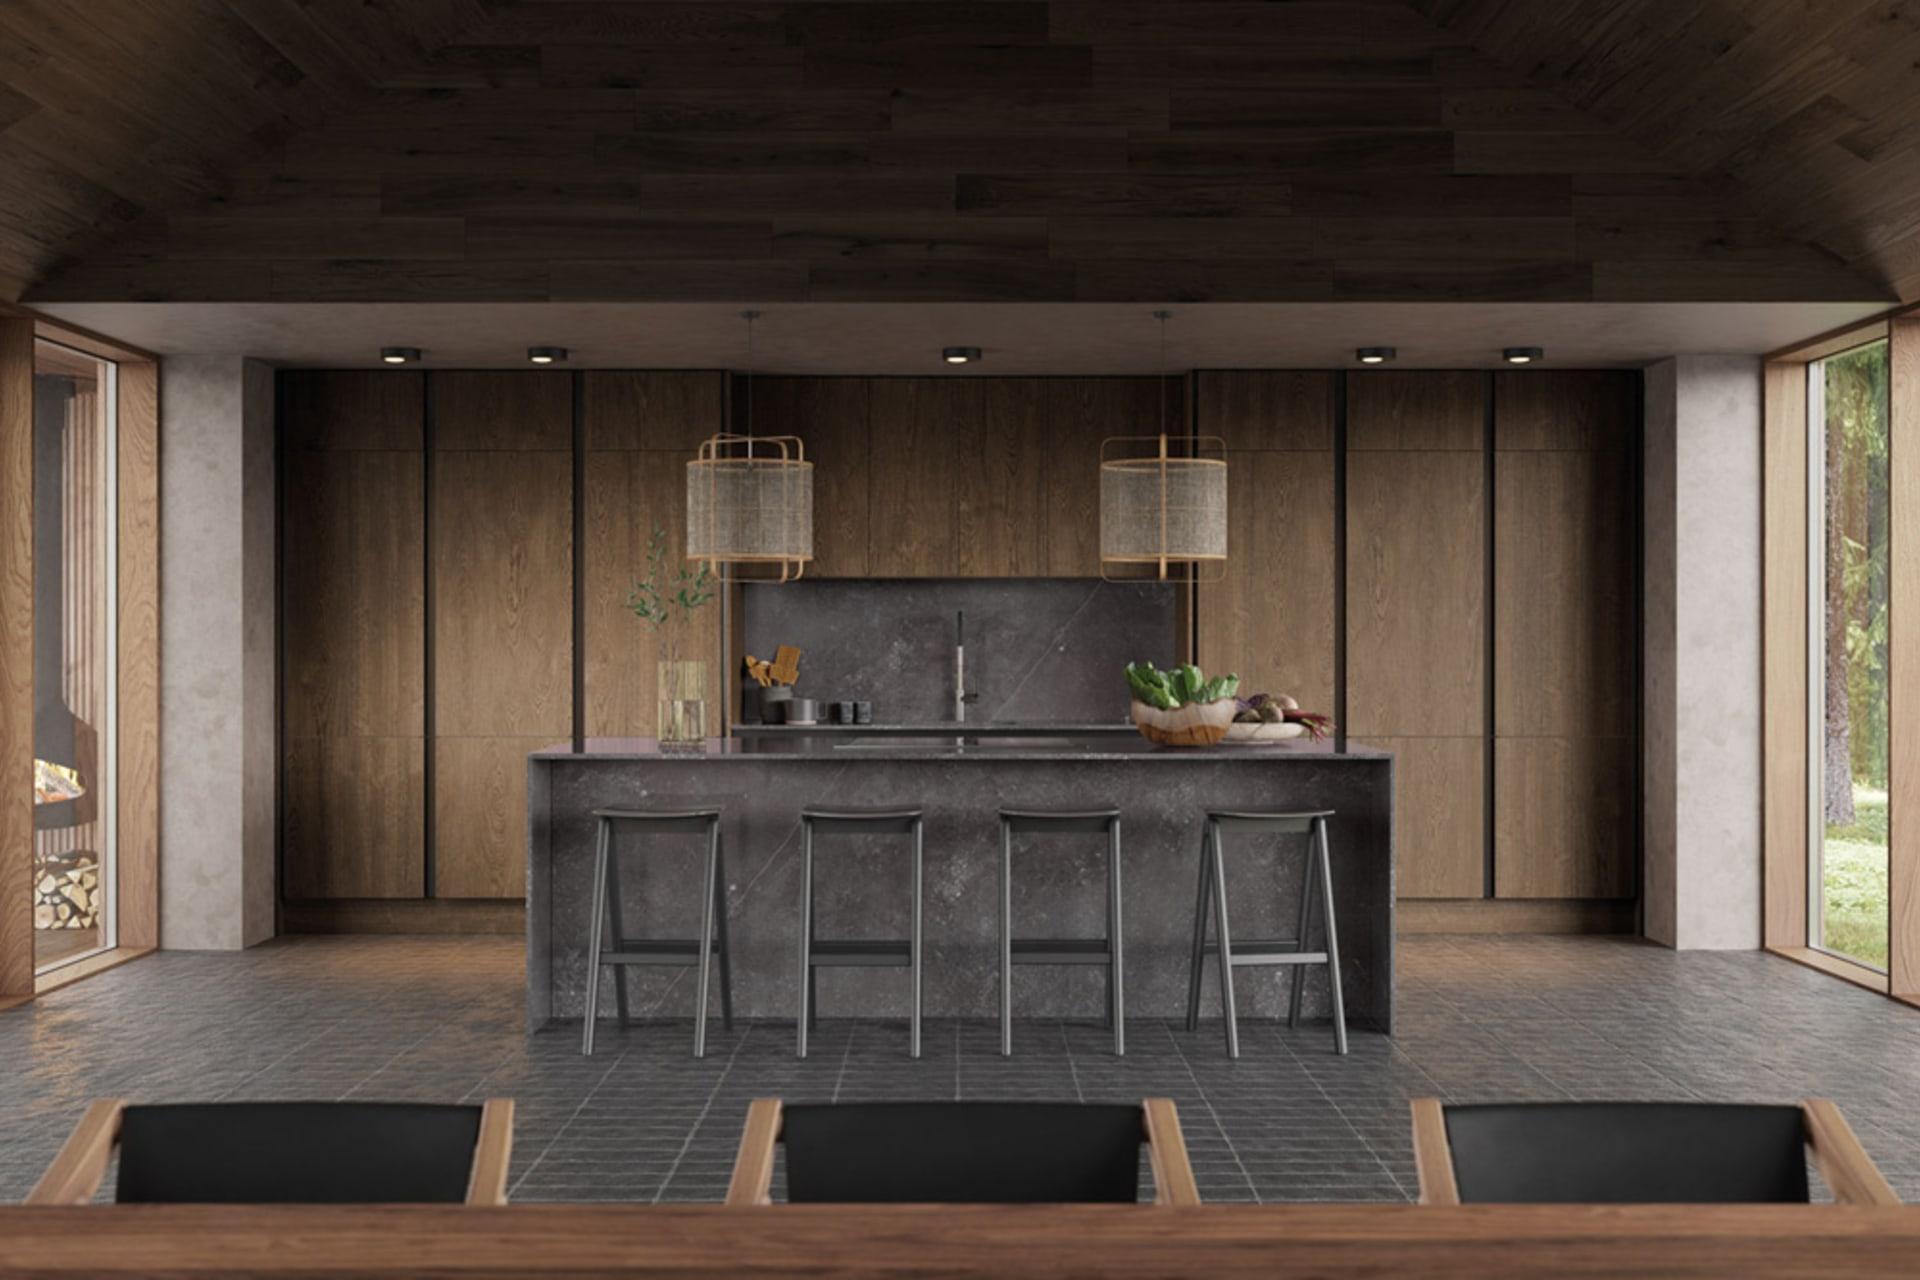 Integra Nordic Nature. Modern kitchen concept with a sleek handless design and fluted oak effect wood doors